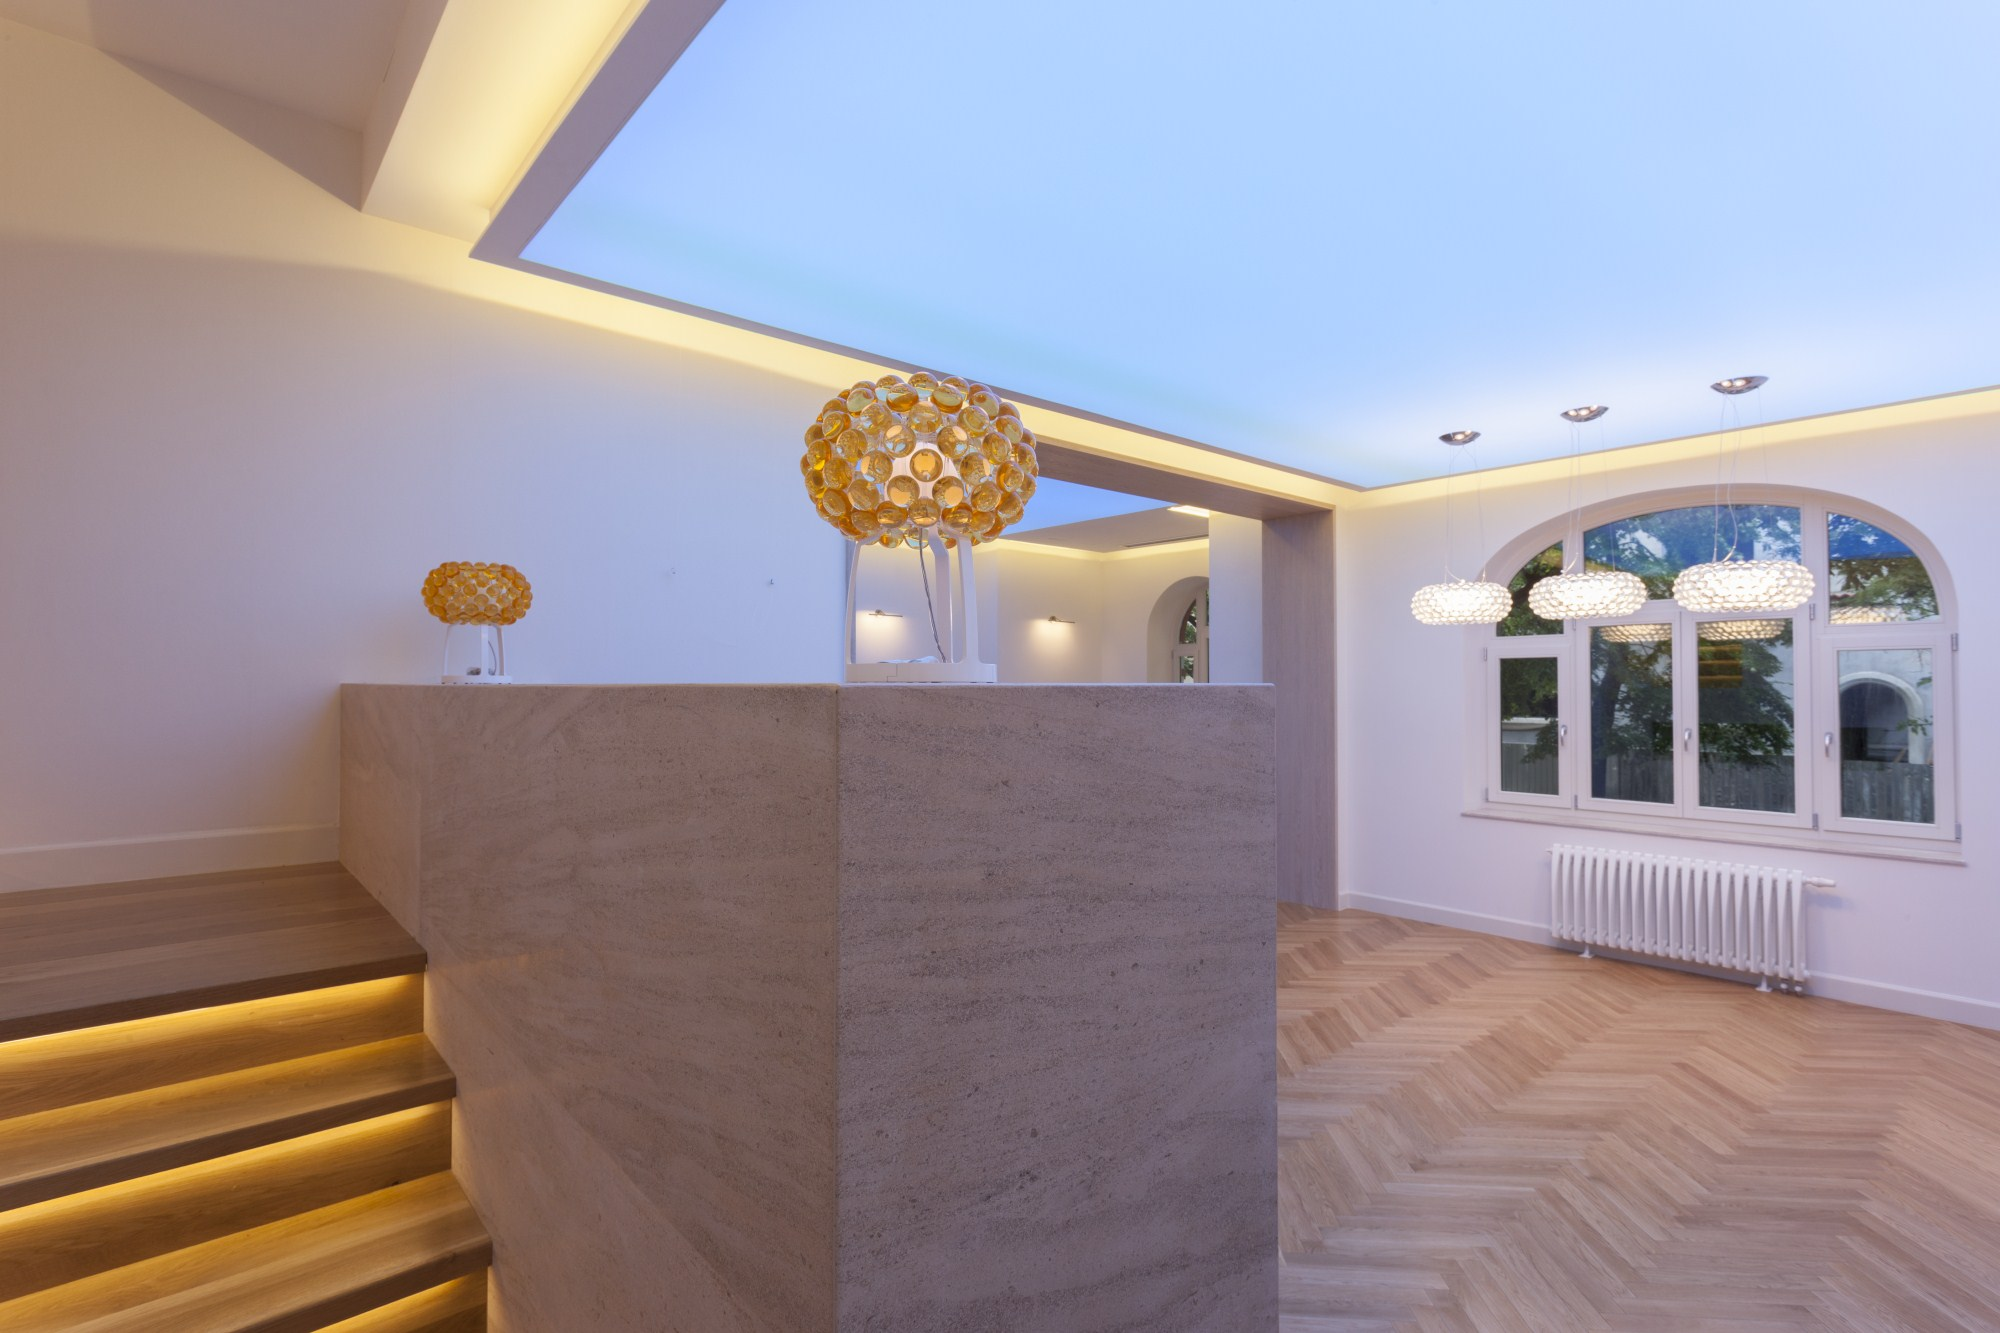 https://nbc-arhitect.ro/wp-content/uploads/2020/10/NBC-Arhitect-_-restorations-_-Washington-House-_-Bucharest-Romania_57.jpg